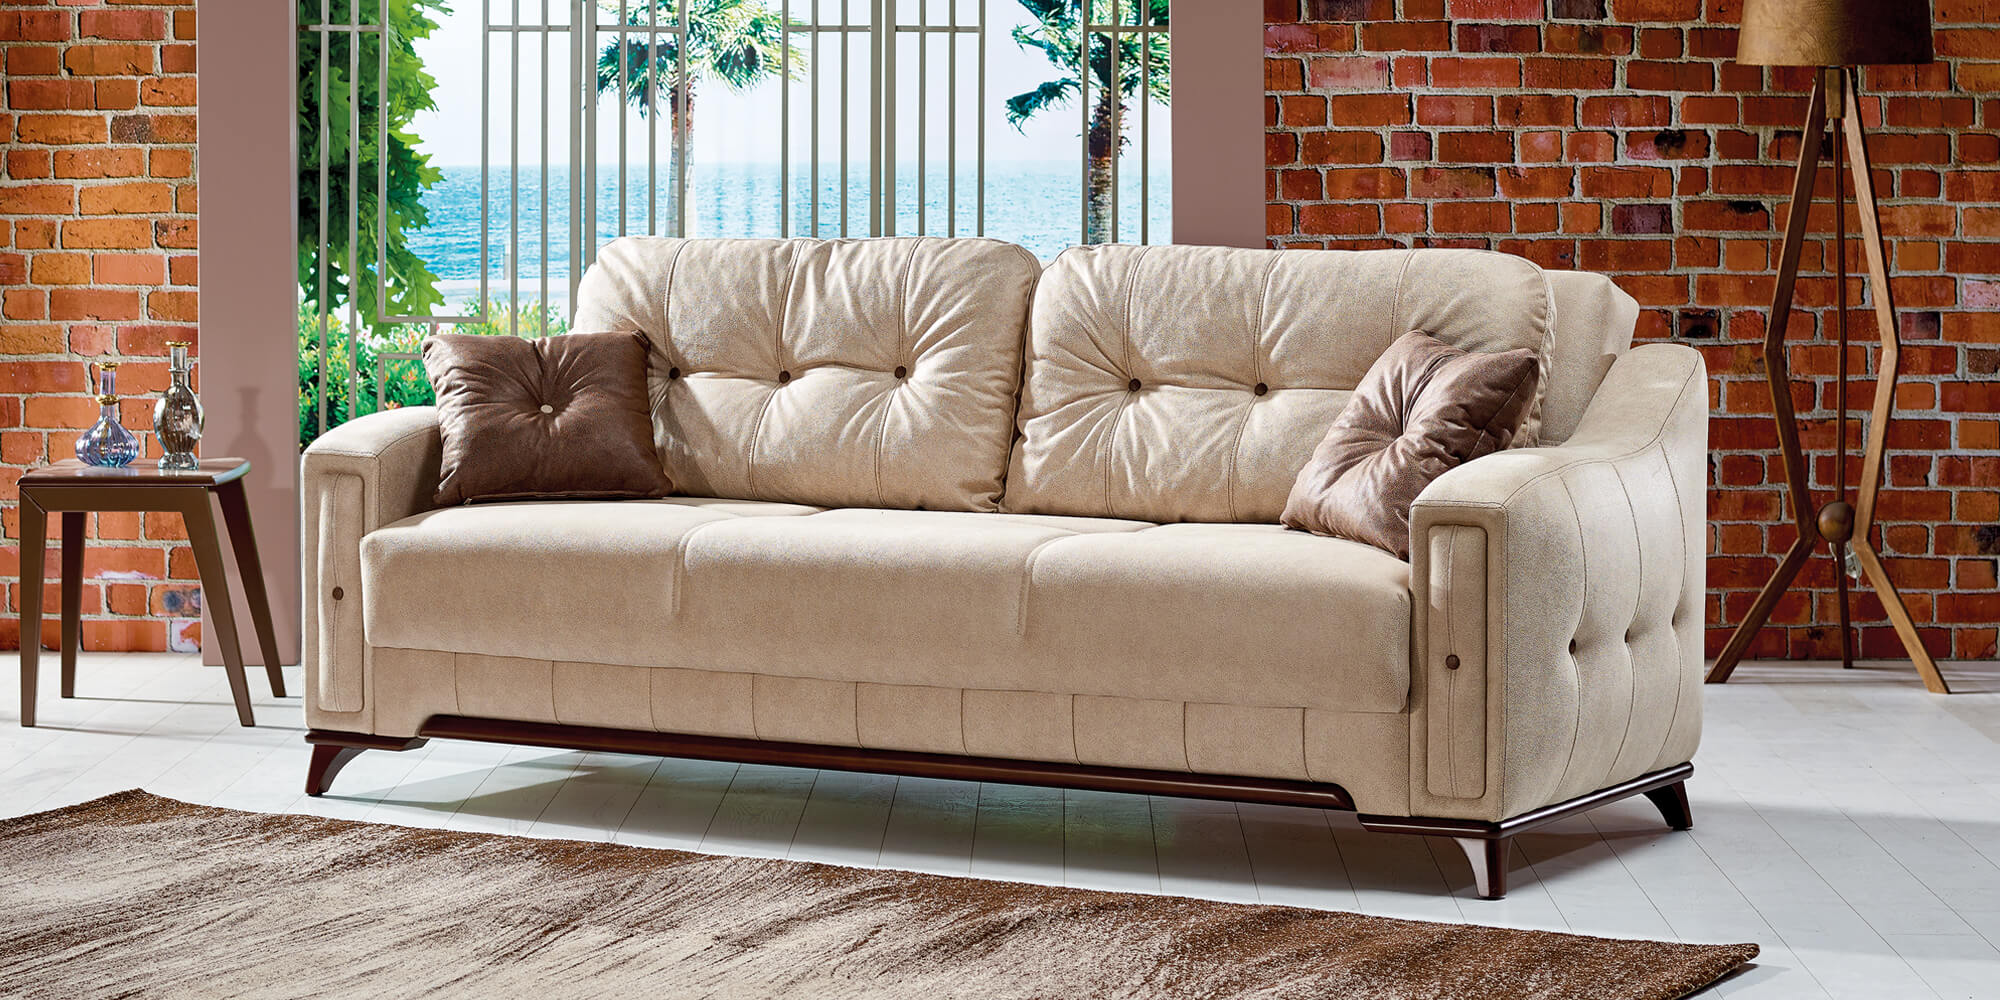 loft 3 2 1 delux sofa set yuvam m belhaus in wuppertal cilek offizieller h ndler in europa. Black Bedroom Furniture Sets. Home Design Ideas